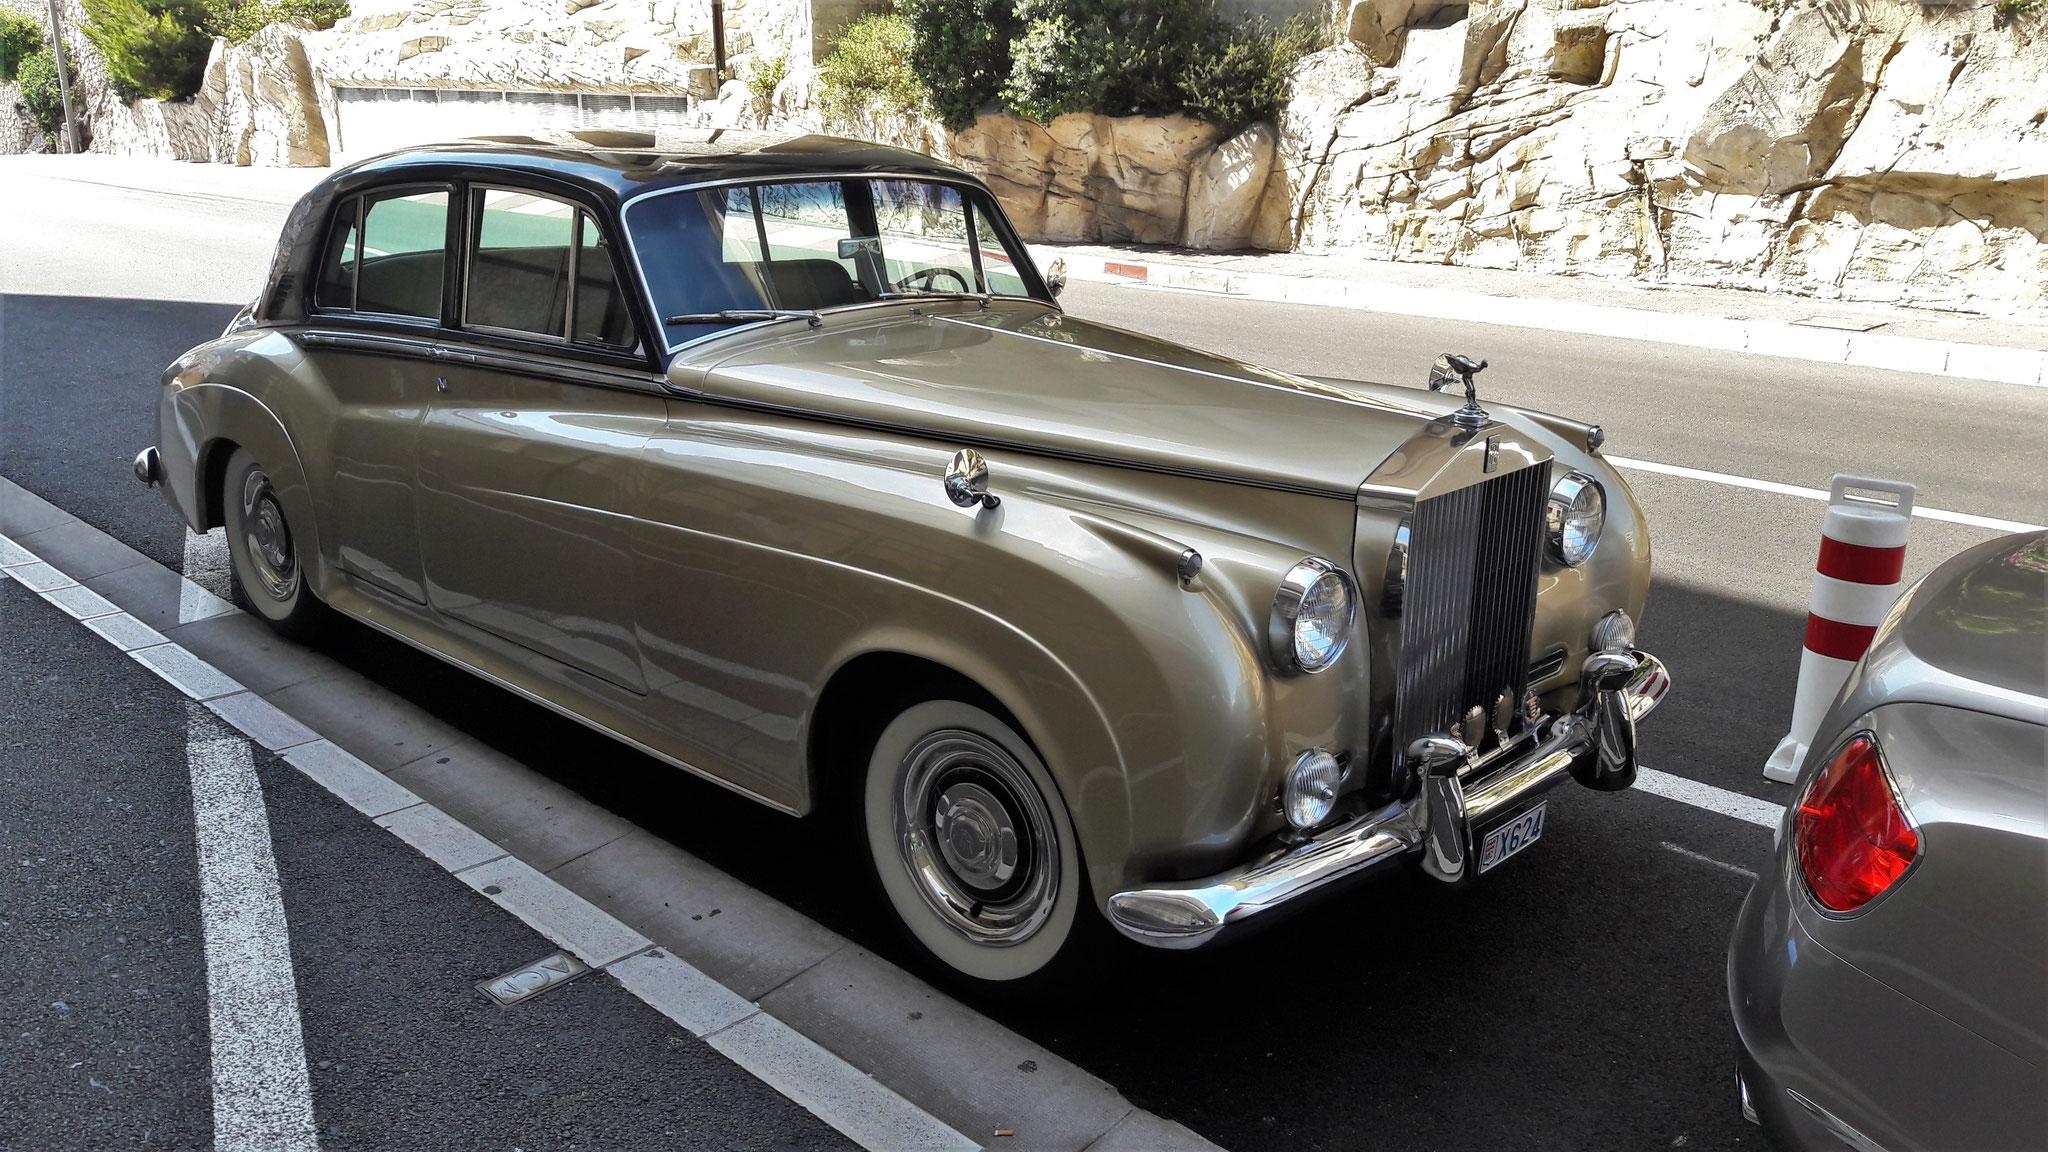 Rolls Royce Silver Cloud I - X624 (MC)